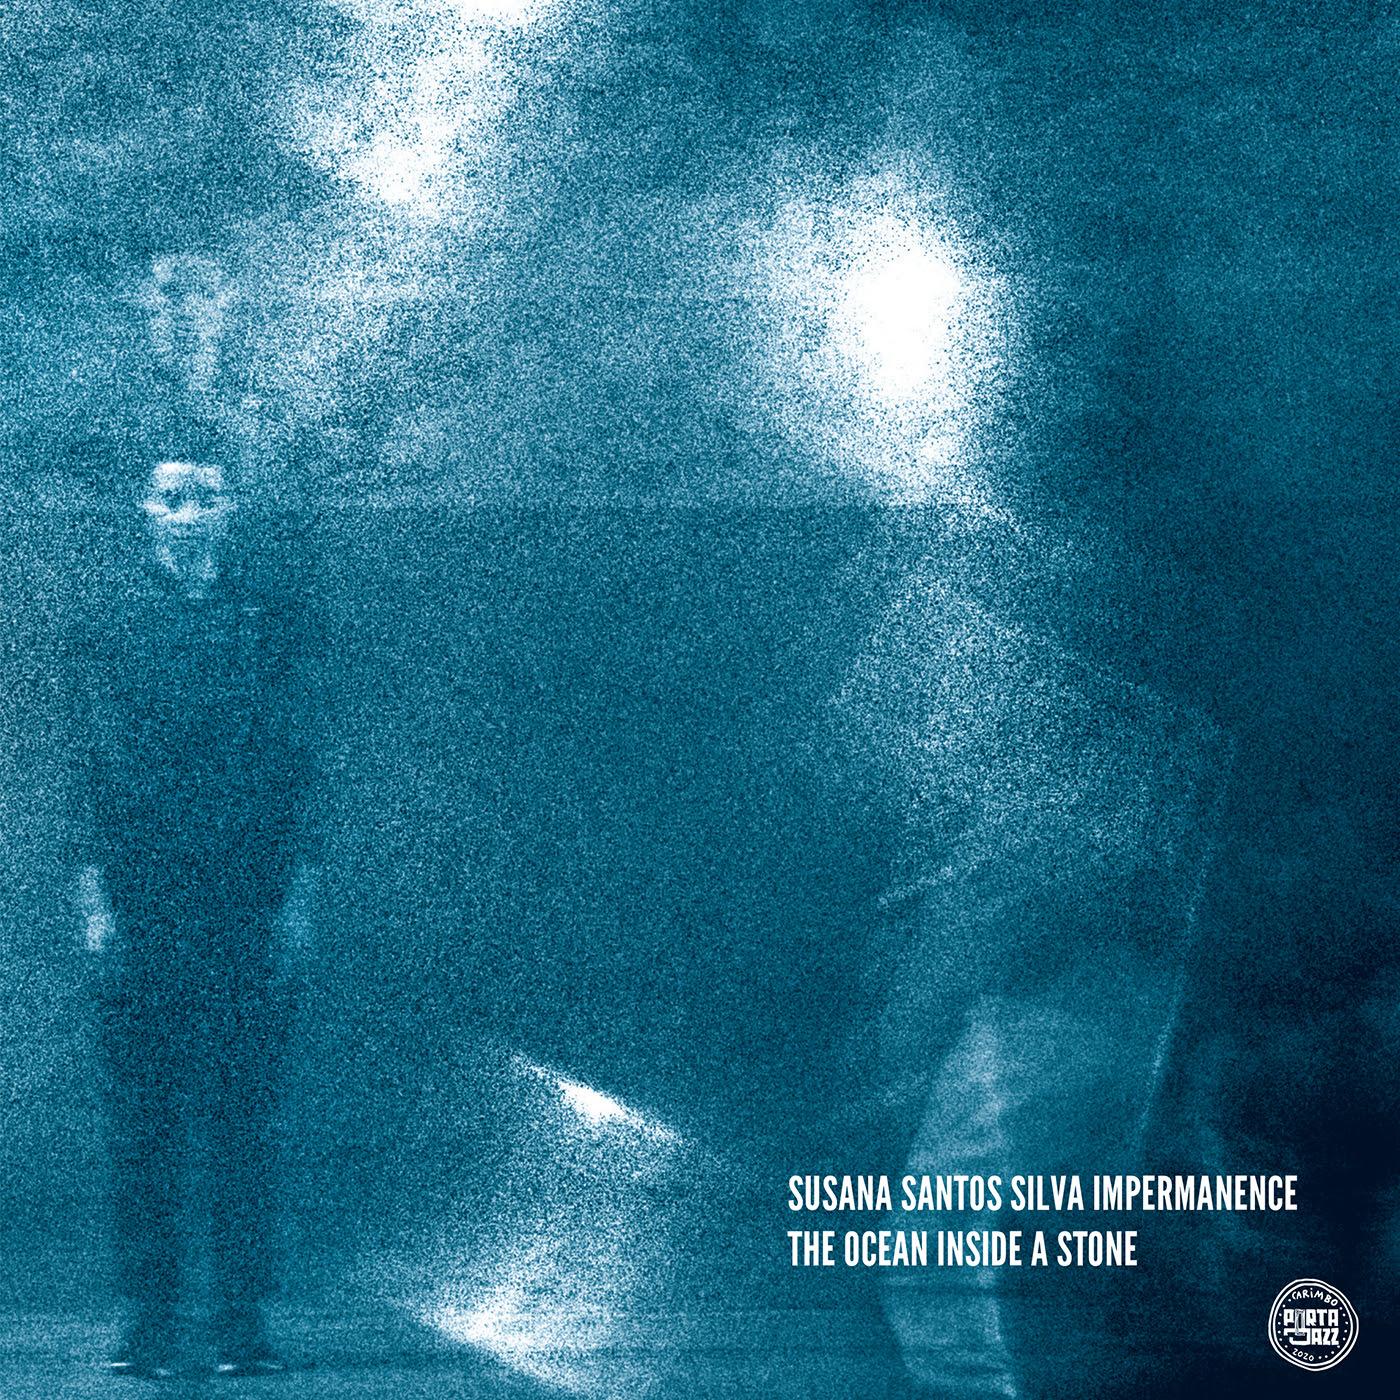 SUSANA SANTOS SILVA - Susana Santos Silva Impermanence : The Ocean Inside a Stone cover